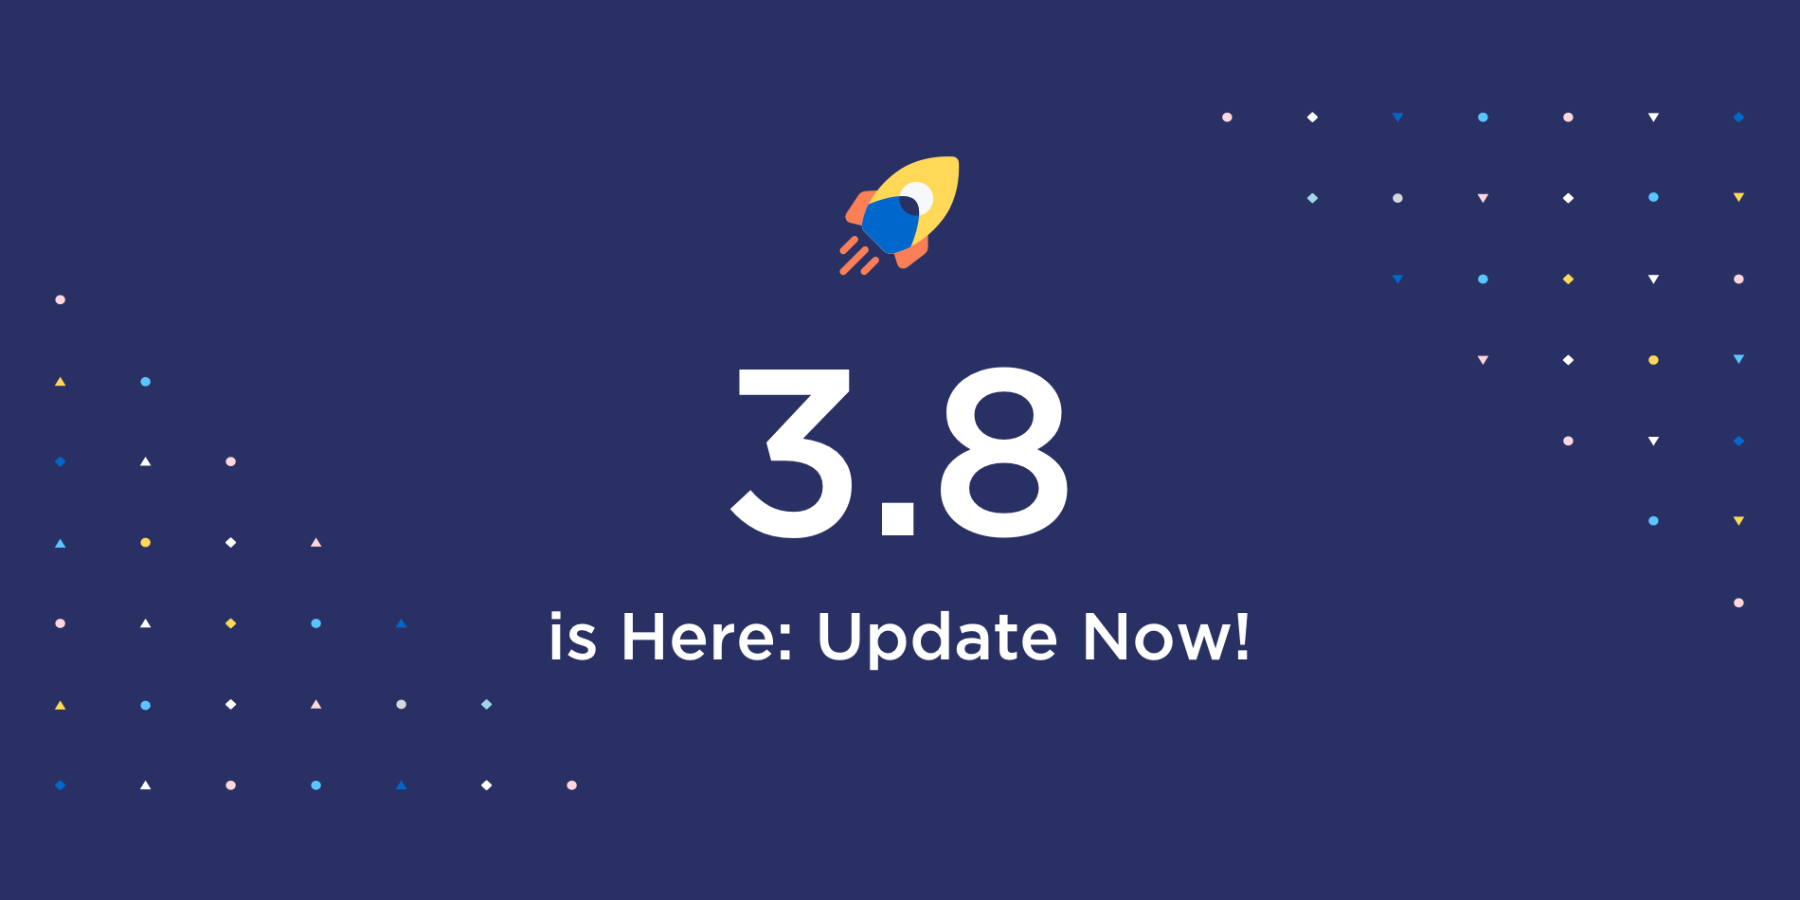 WP Rocket 3.8